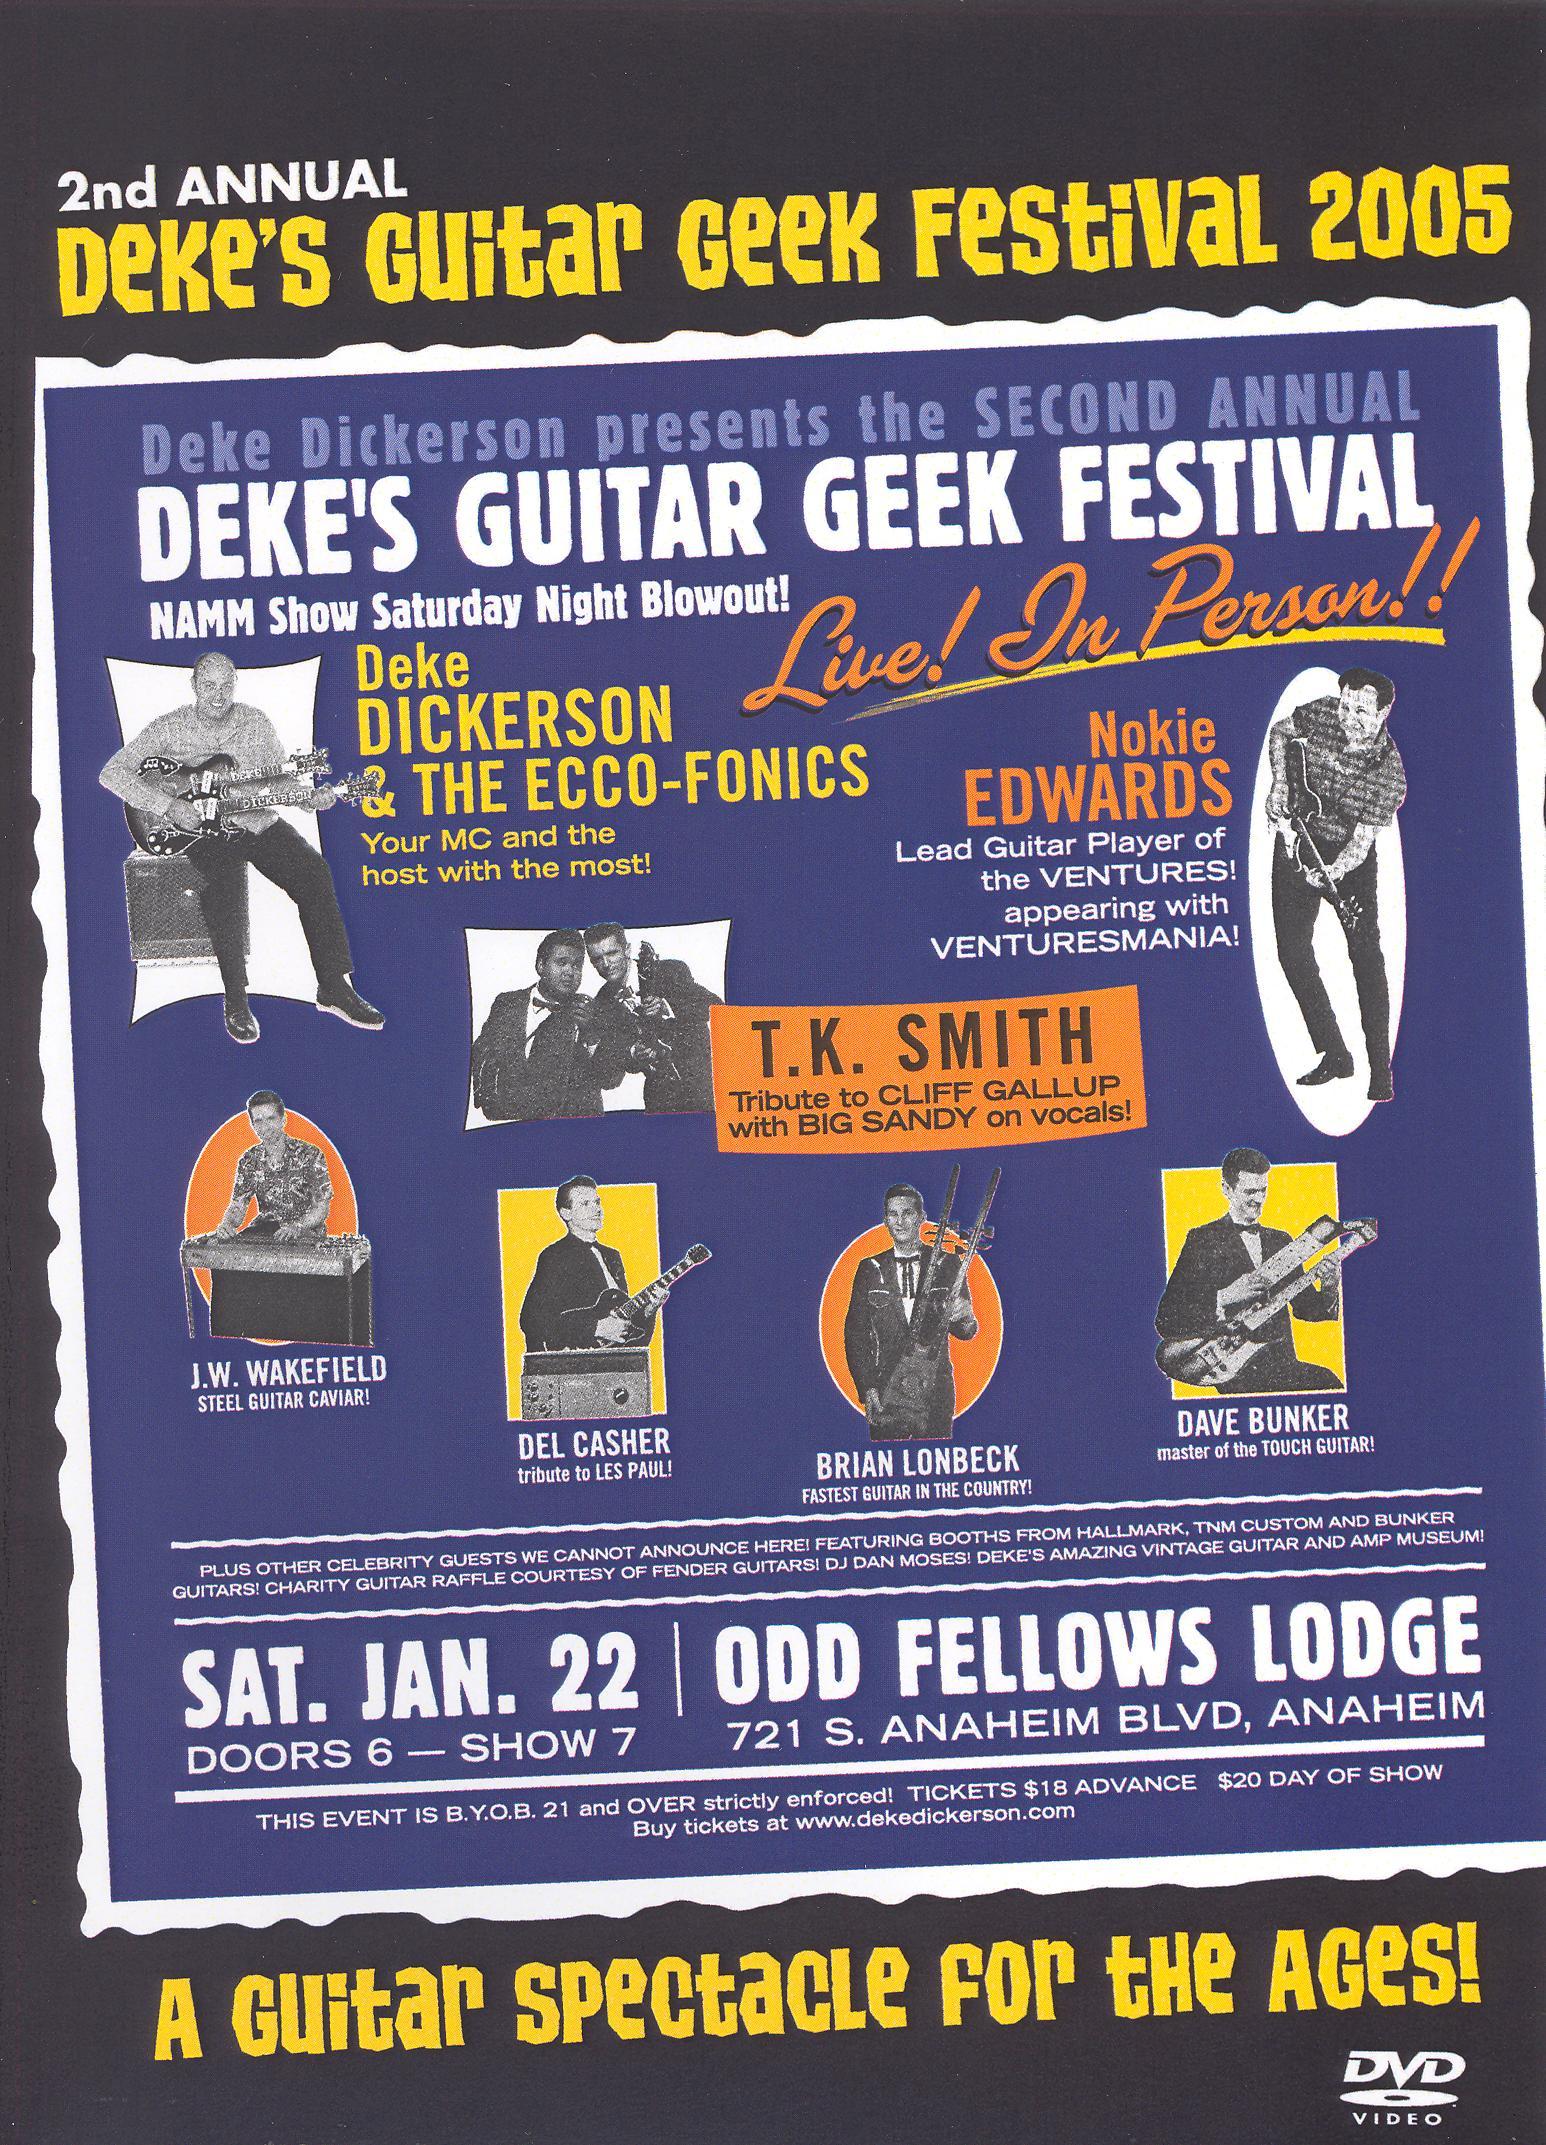 Deke's Guitar Geek Festival 2: 2005